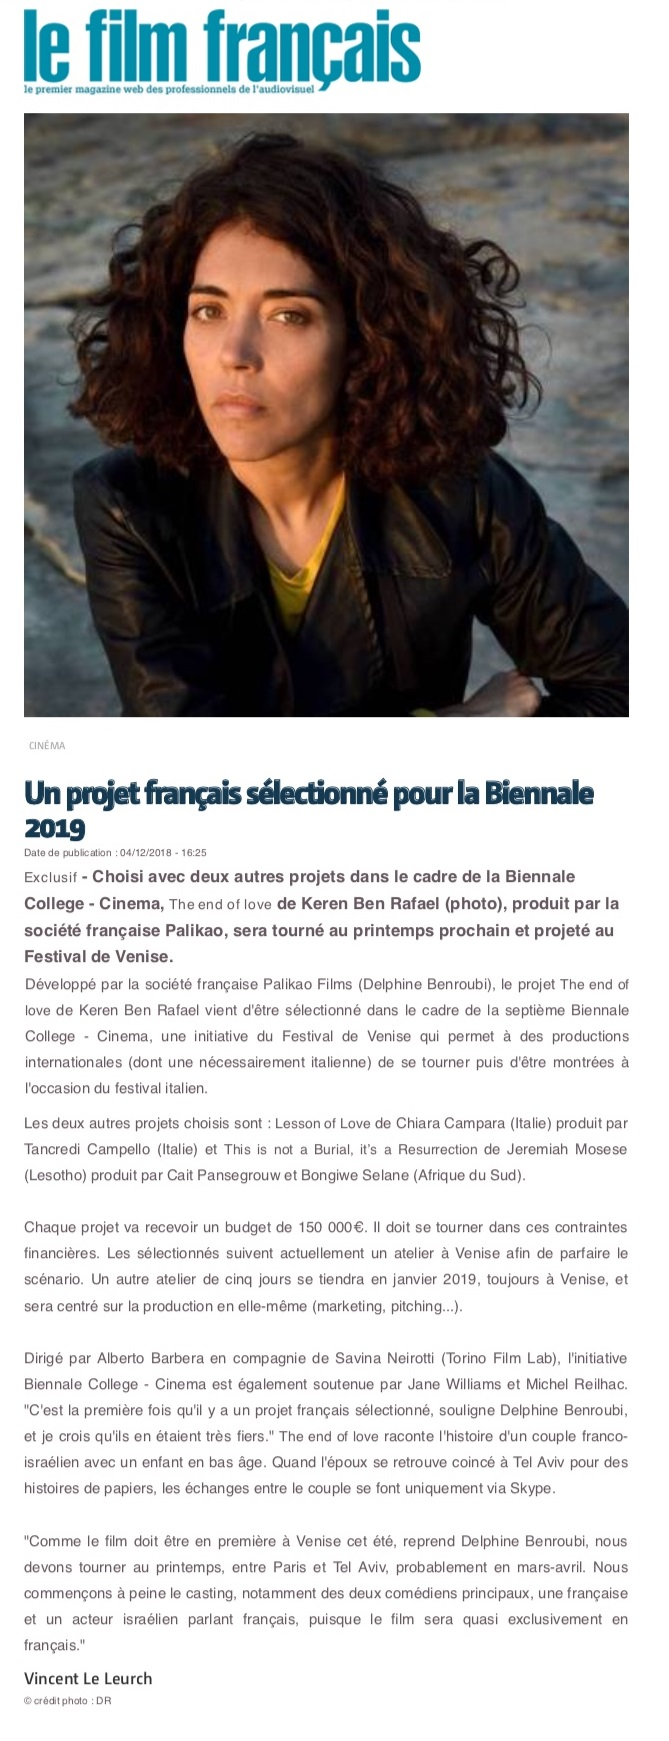 film francais decembre 2018 1